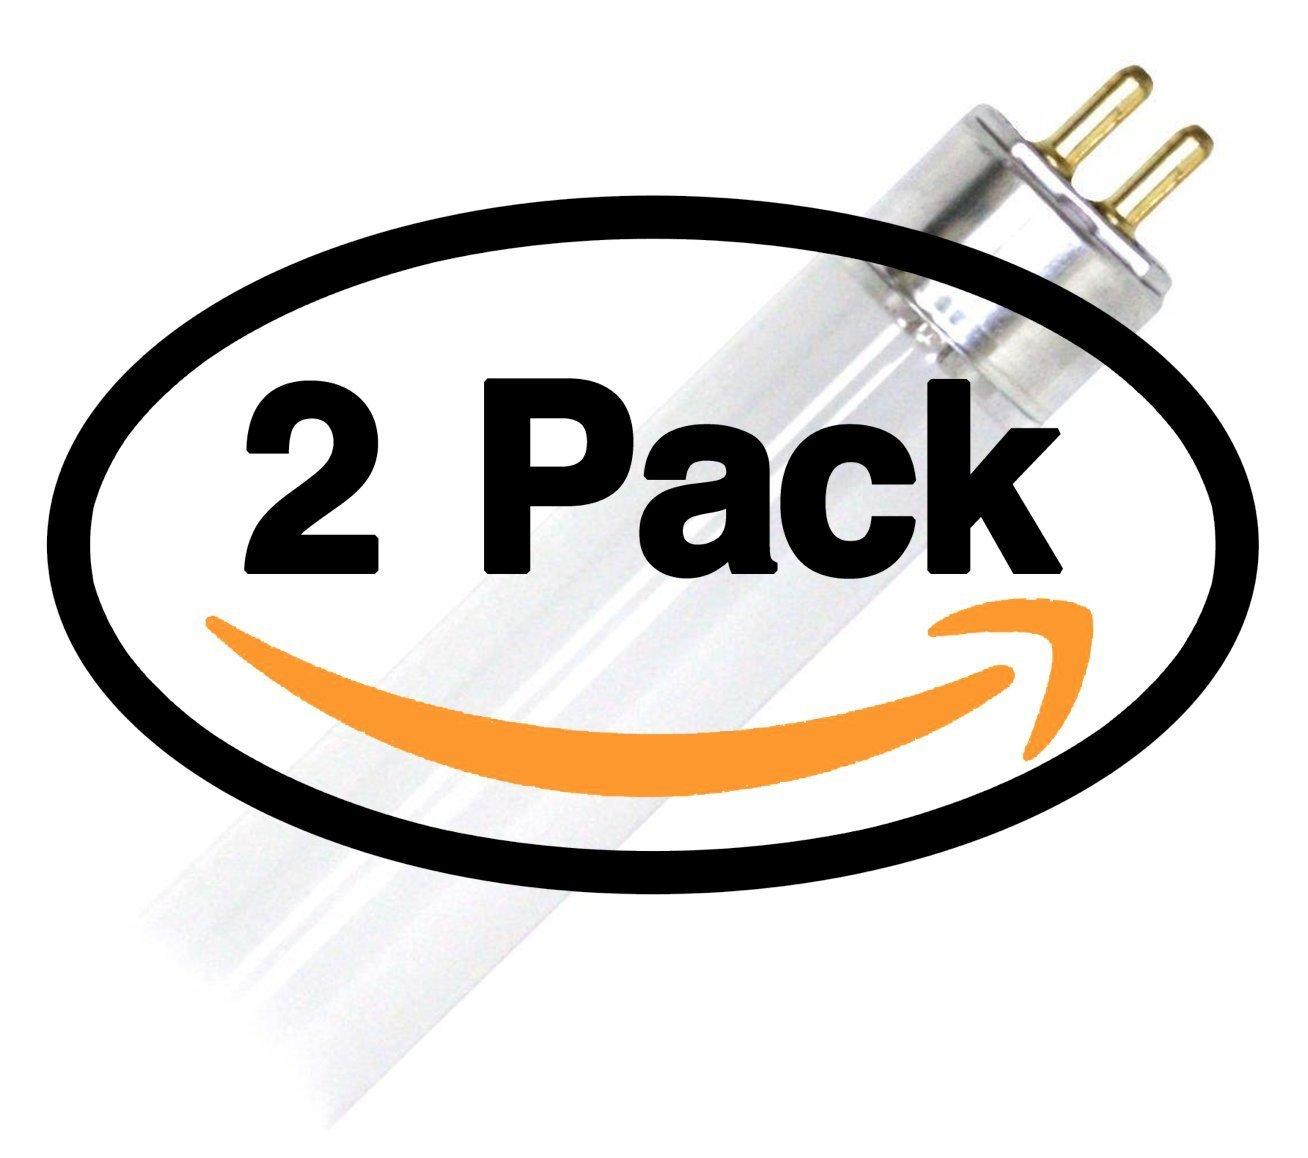 (2 Pack) Sylvania 20926 - FP35/835/ECO 35 Watt T5 Fluorescent Tube Light Bulb 35W F35T5-3500K Replaces F35W/T5/835/ECO F35T5/835/ALTO